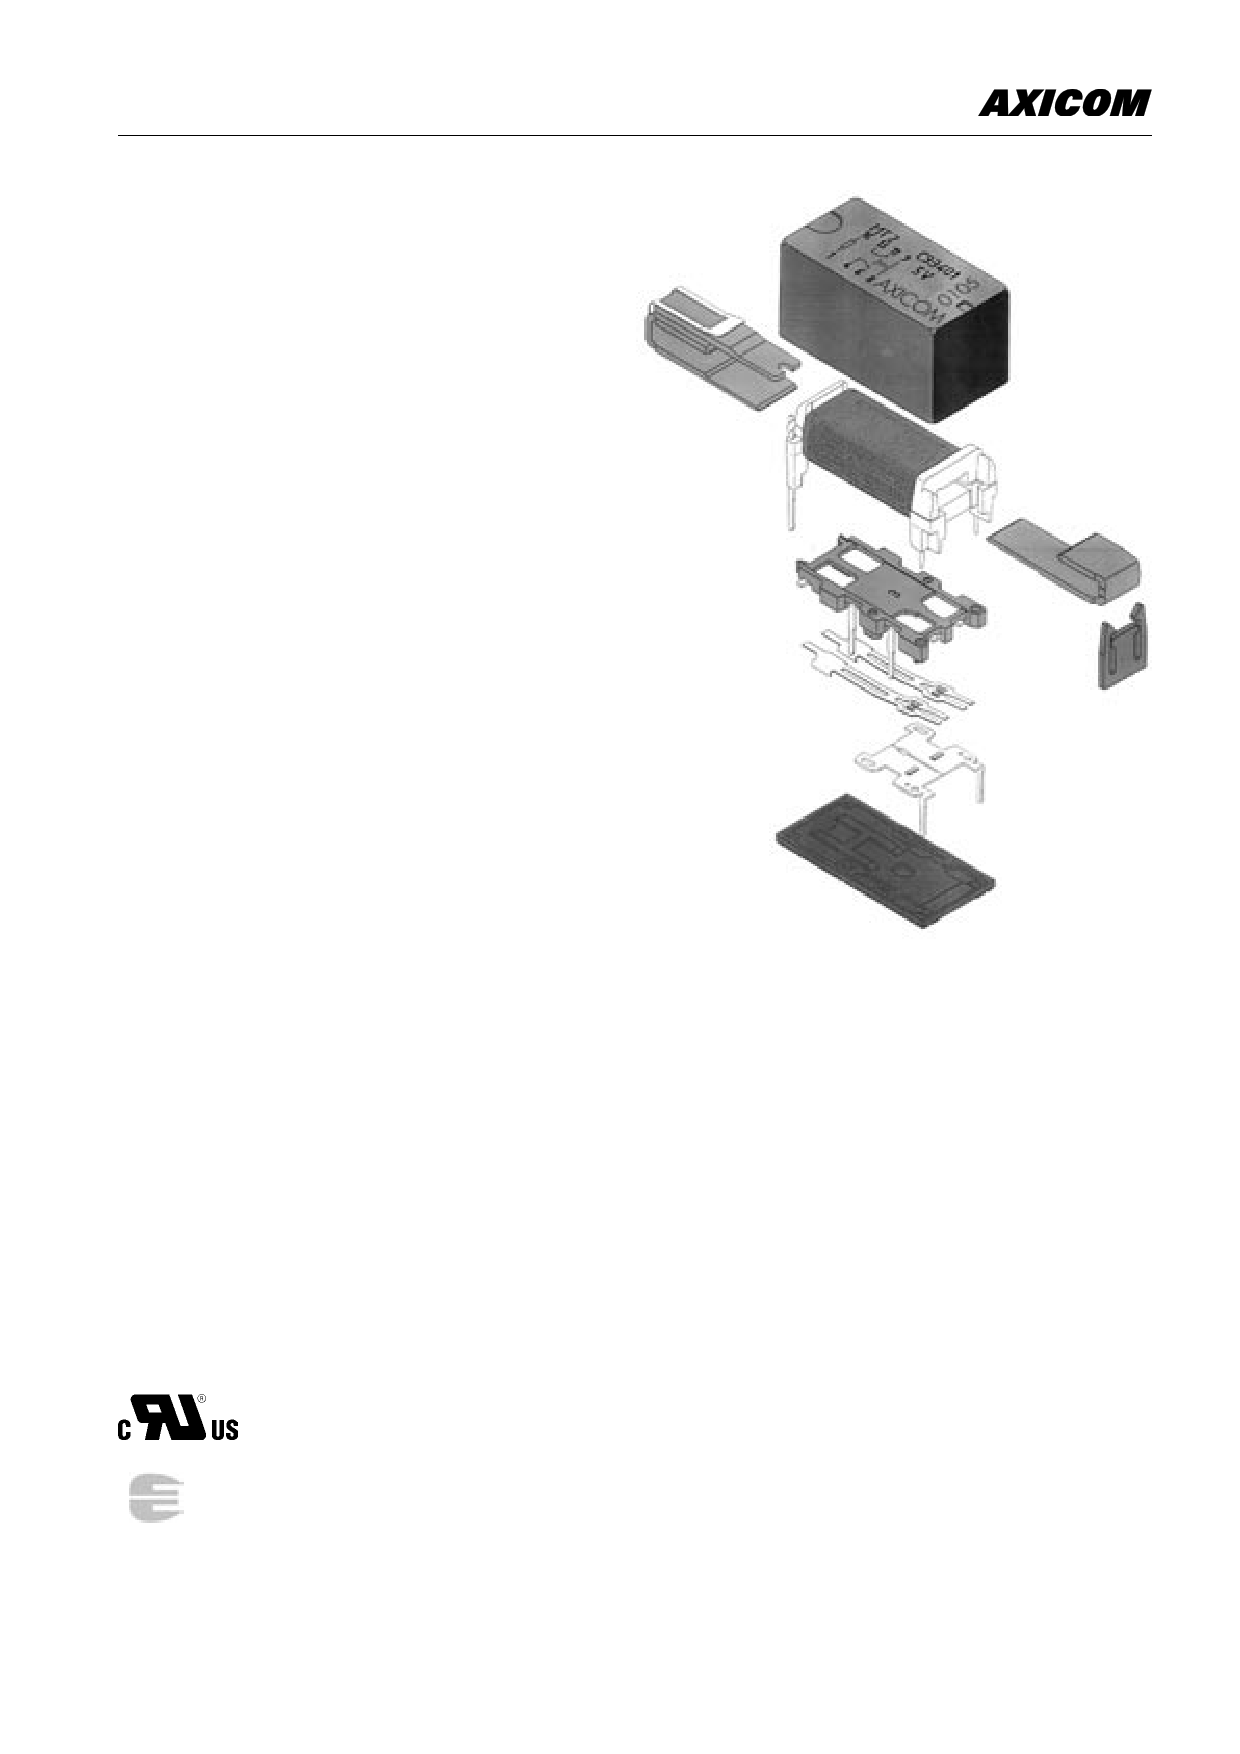 2-1462000-0 Даташит, Описание, Даташиты